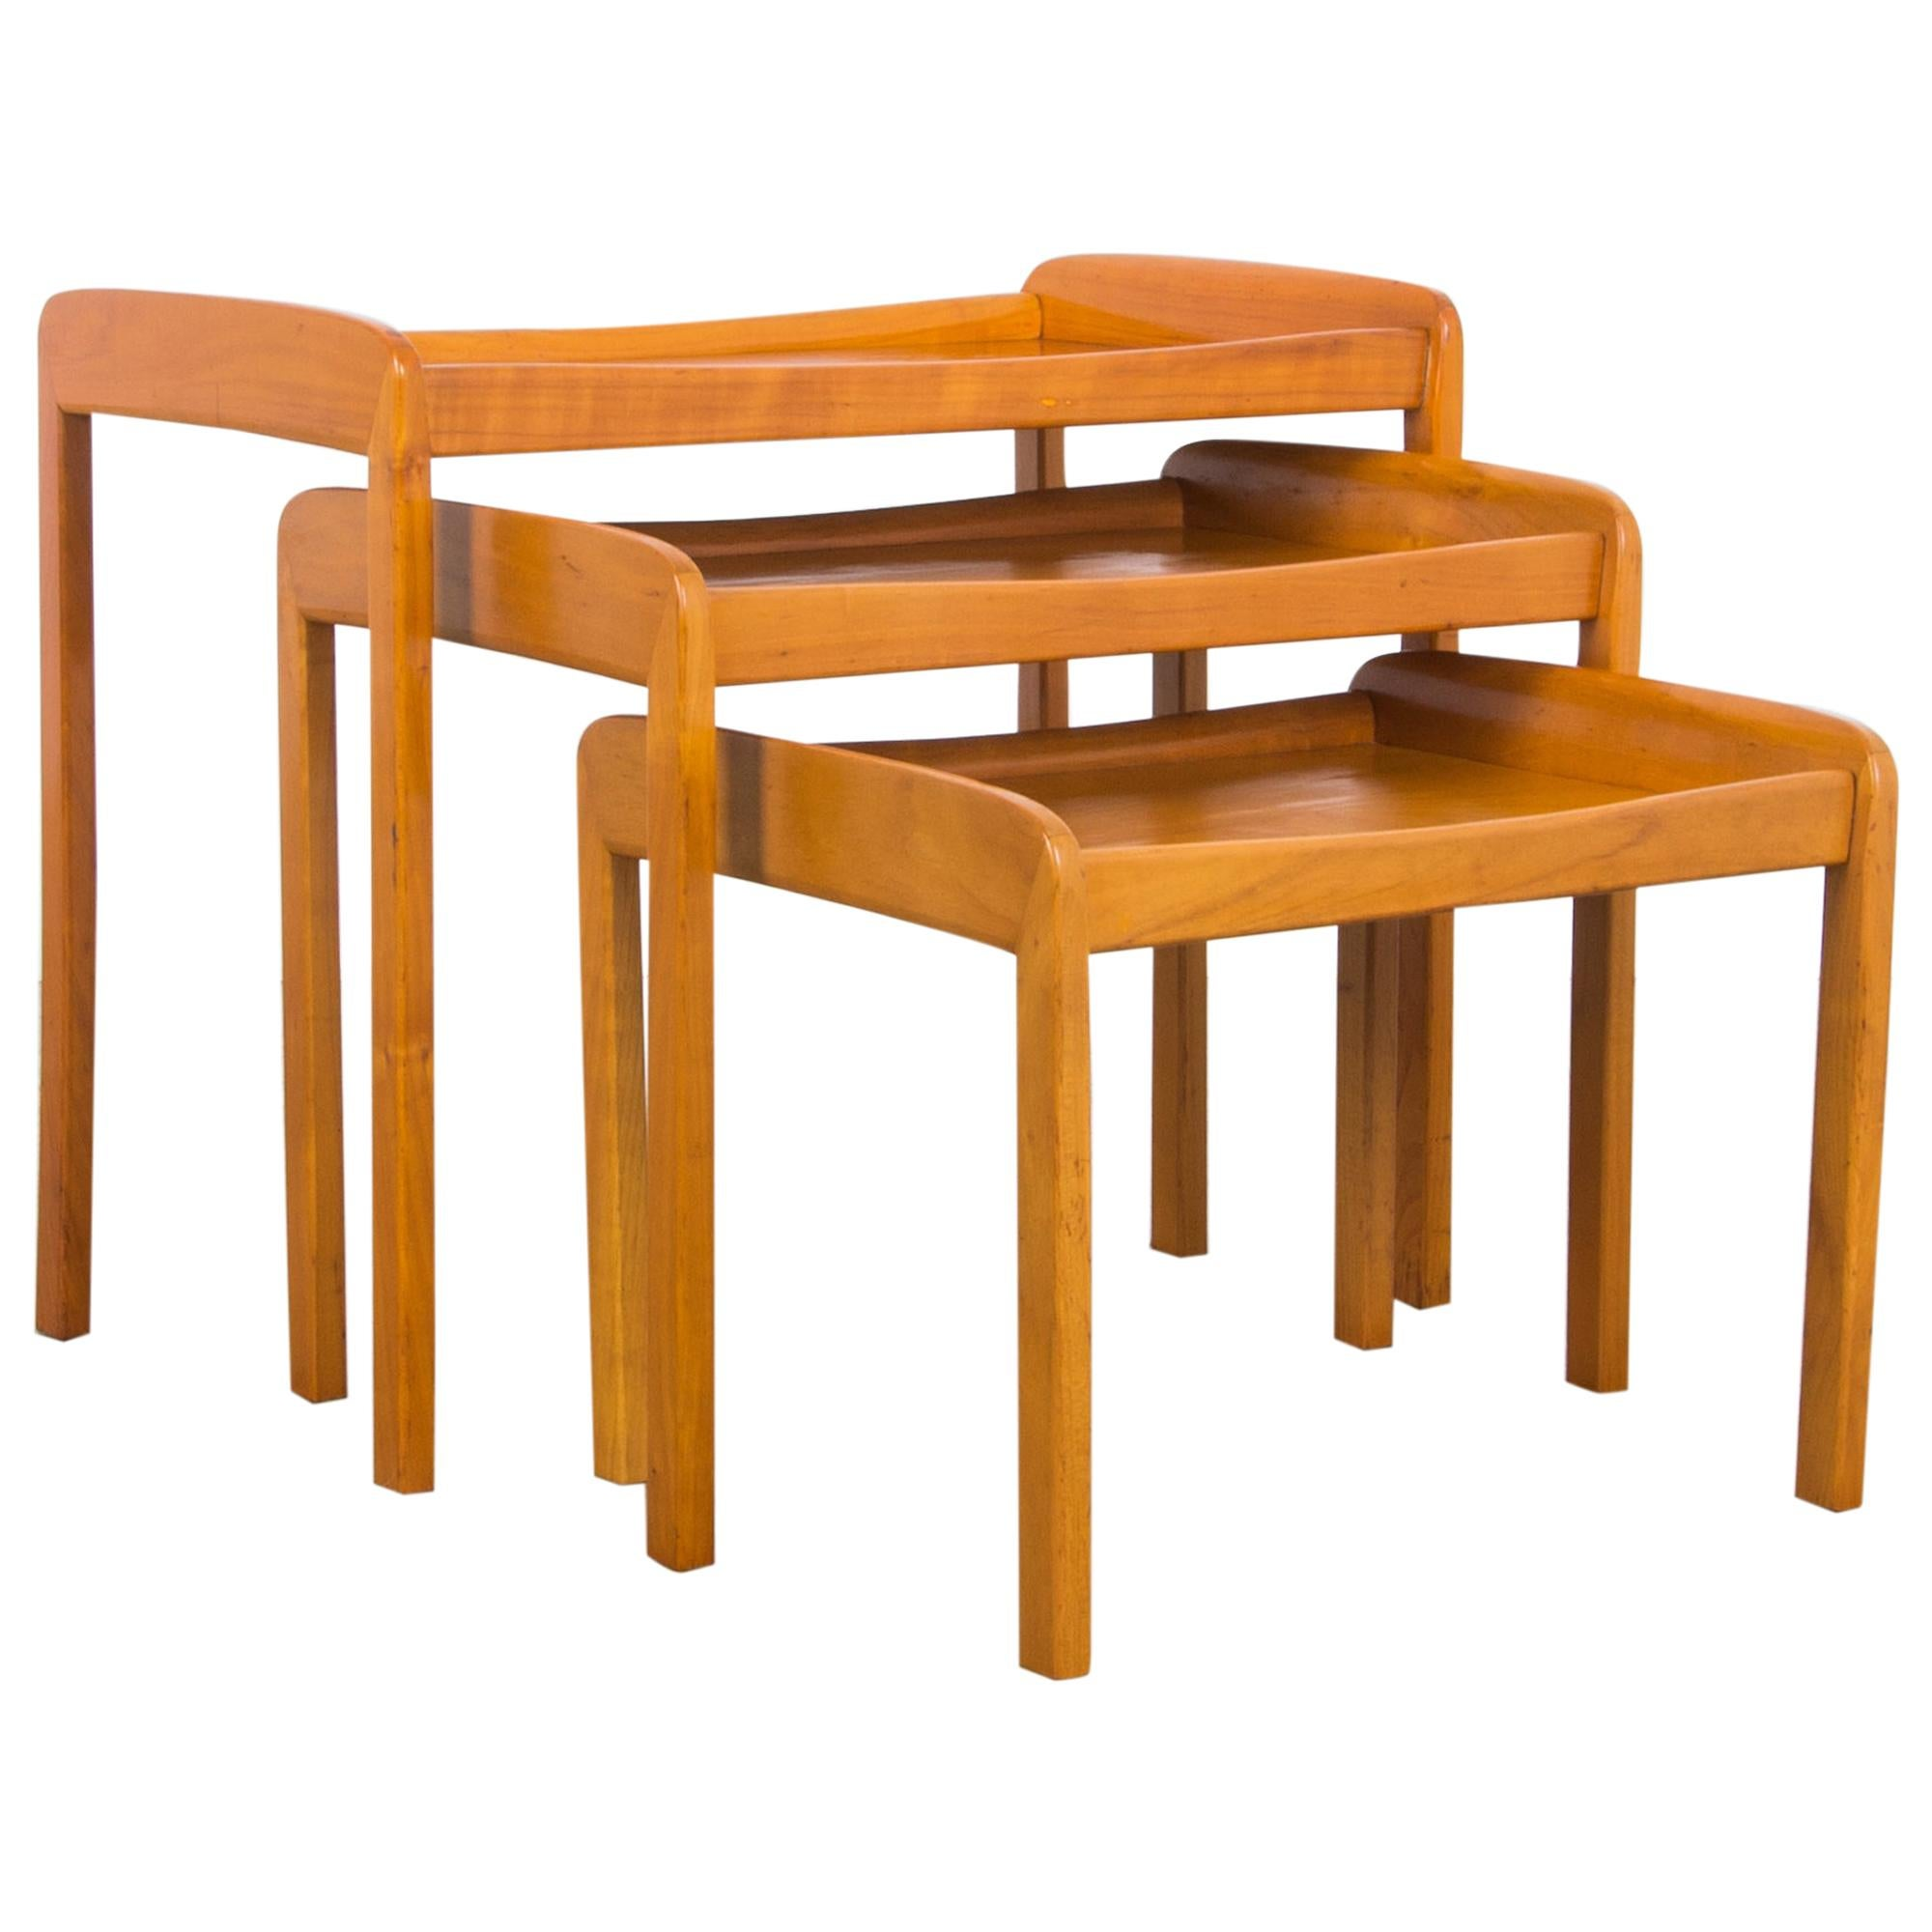 Mid-Century Modern Wooden Nesting Tables, Set of Three